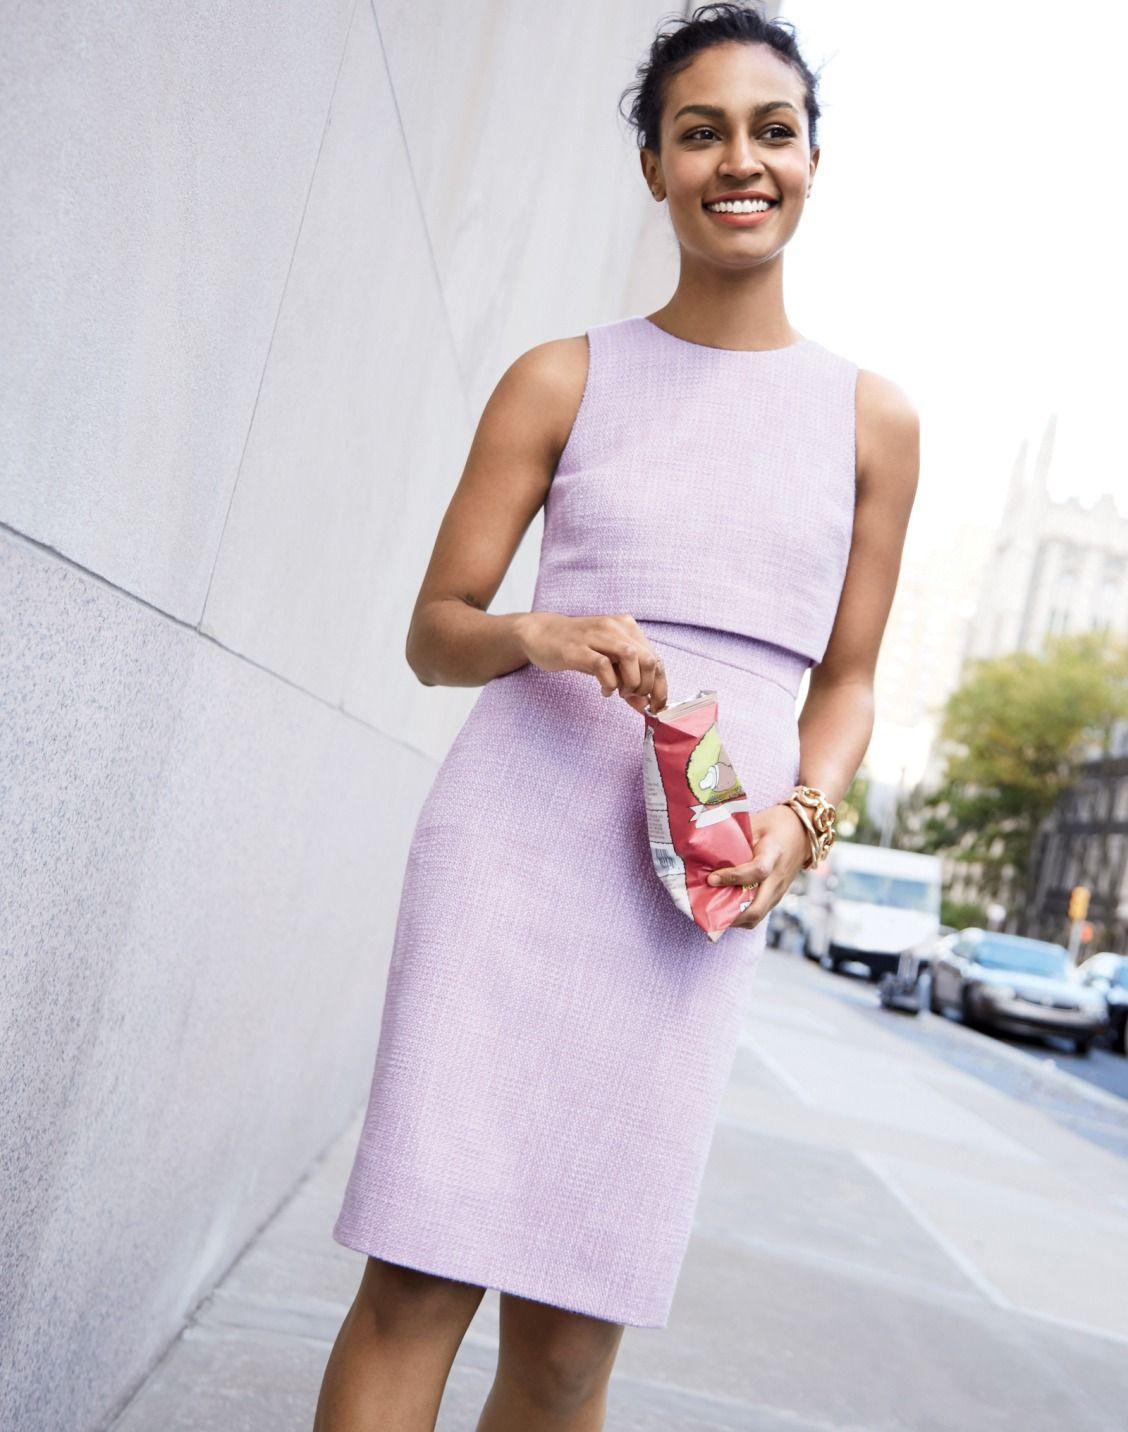 Going Places Dress In Tweed : Women Wear To Work. Corner OfficeOffice ...